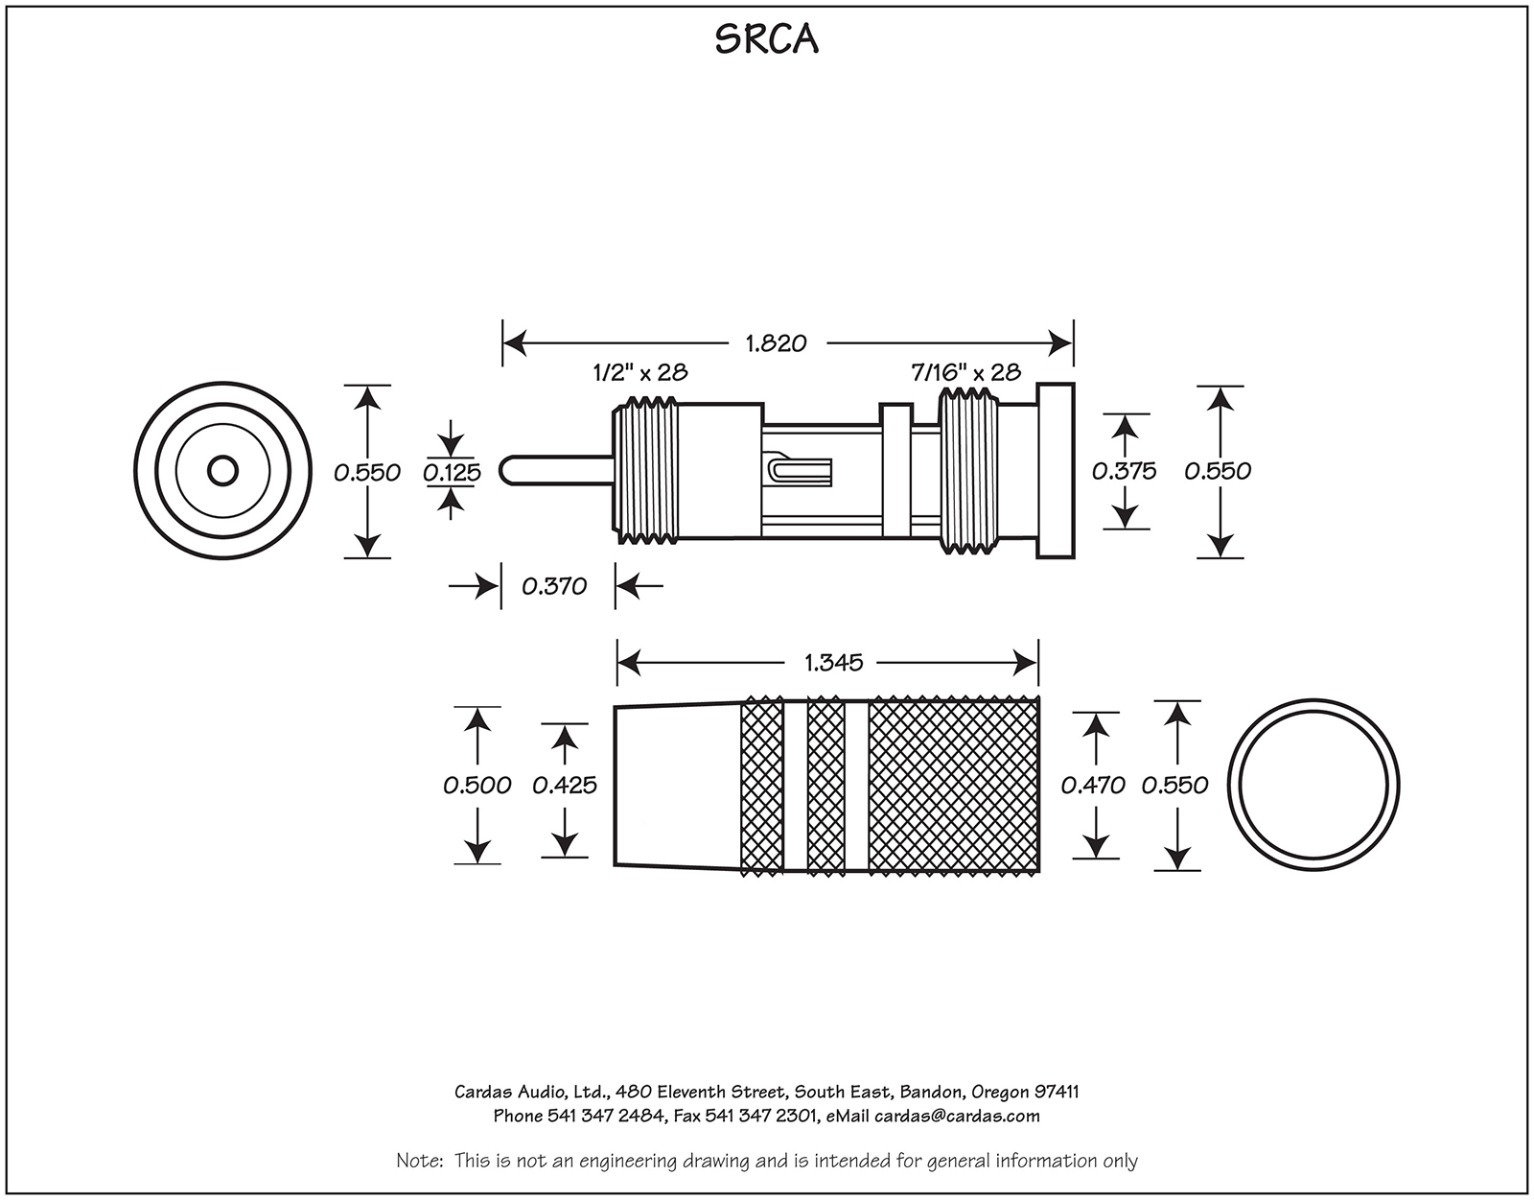 Cardas SRCA Male Plug Dimensions